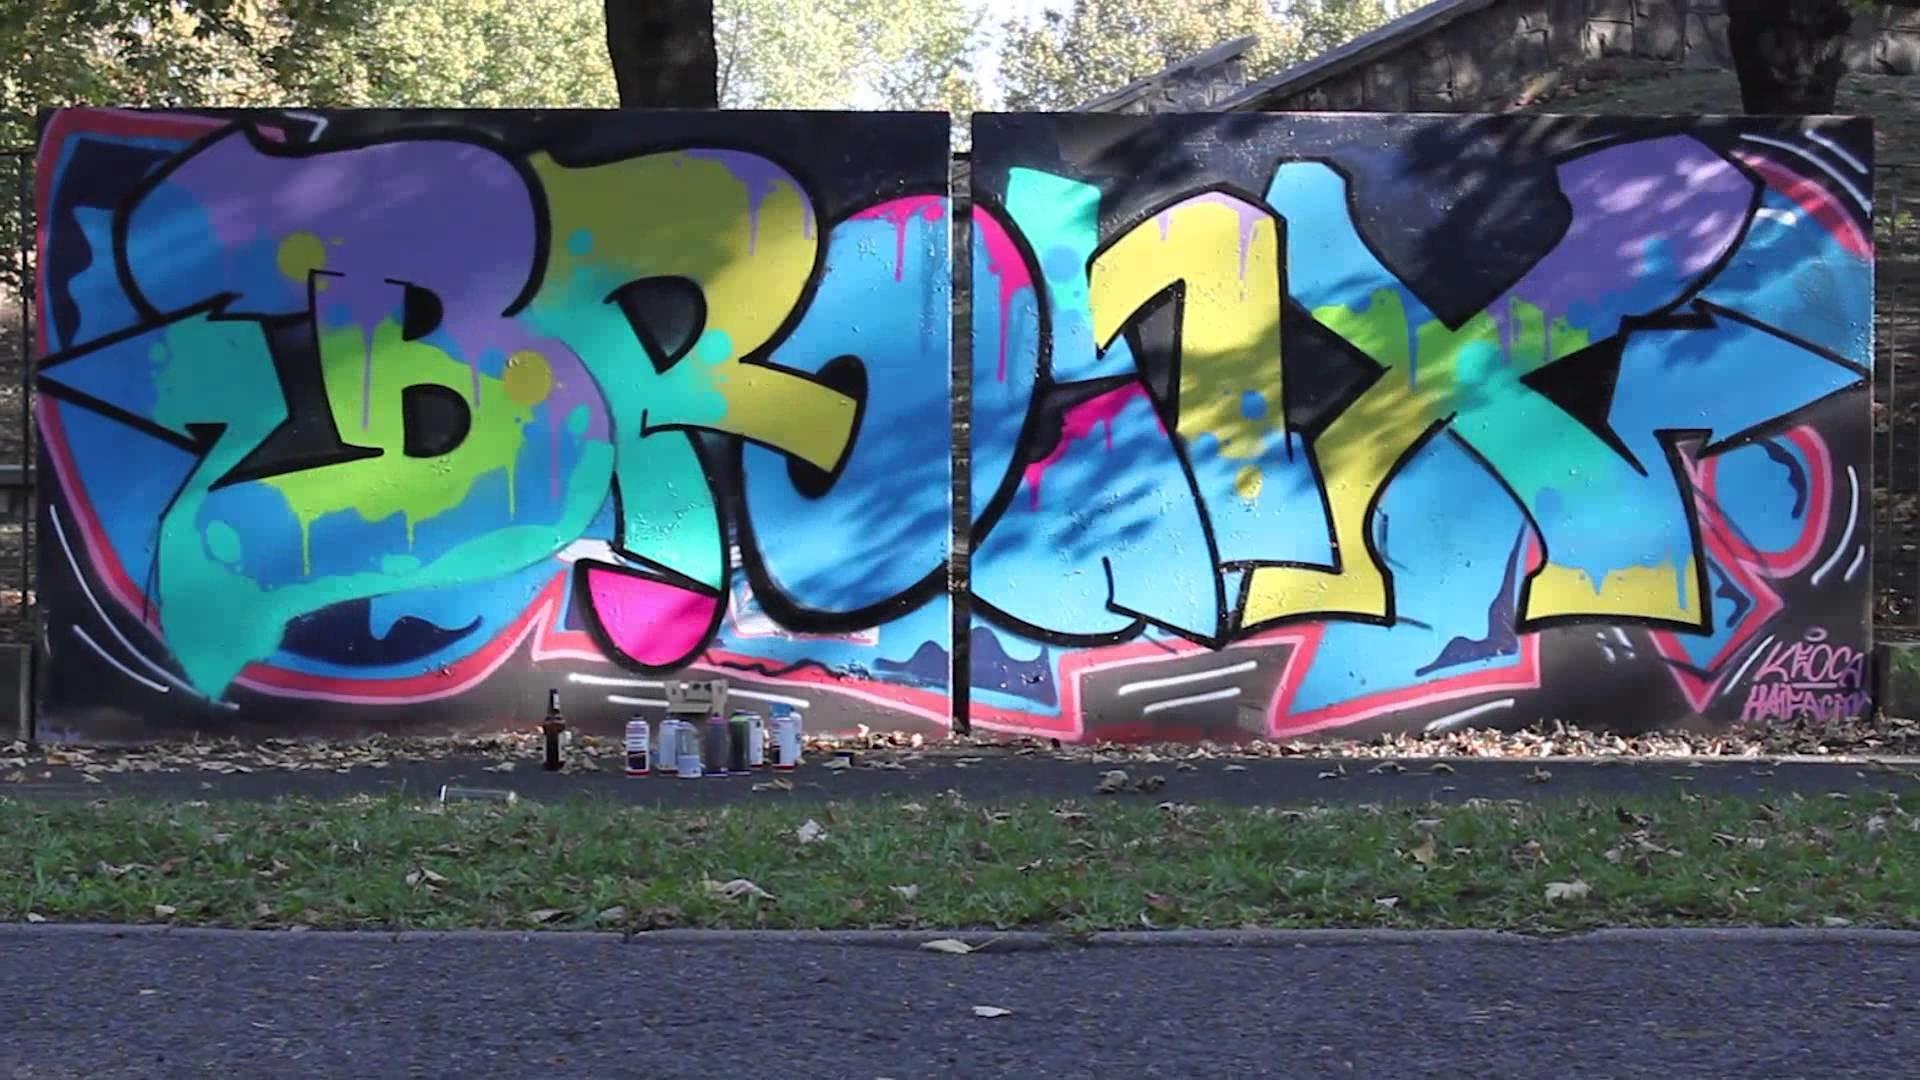 BRONX HIP HOP FESTIVAL – PROMO GRAFFITI